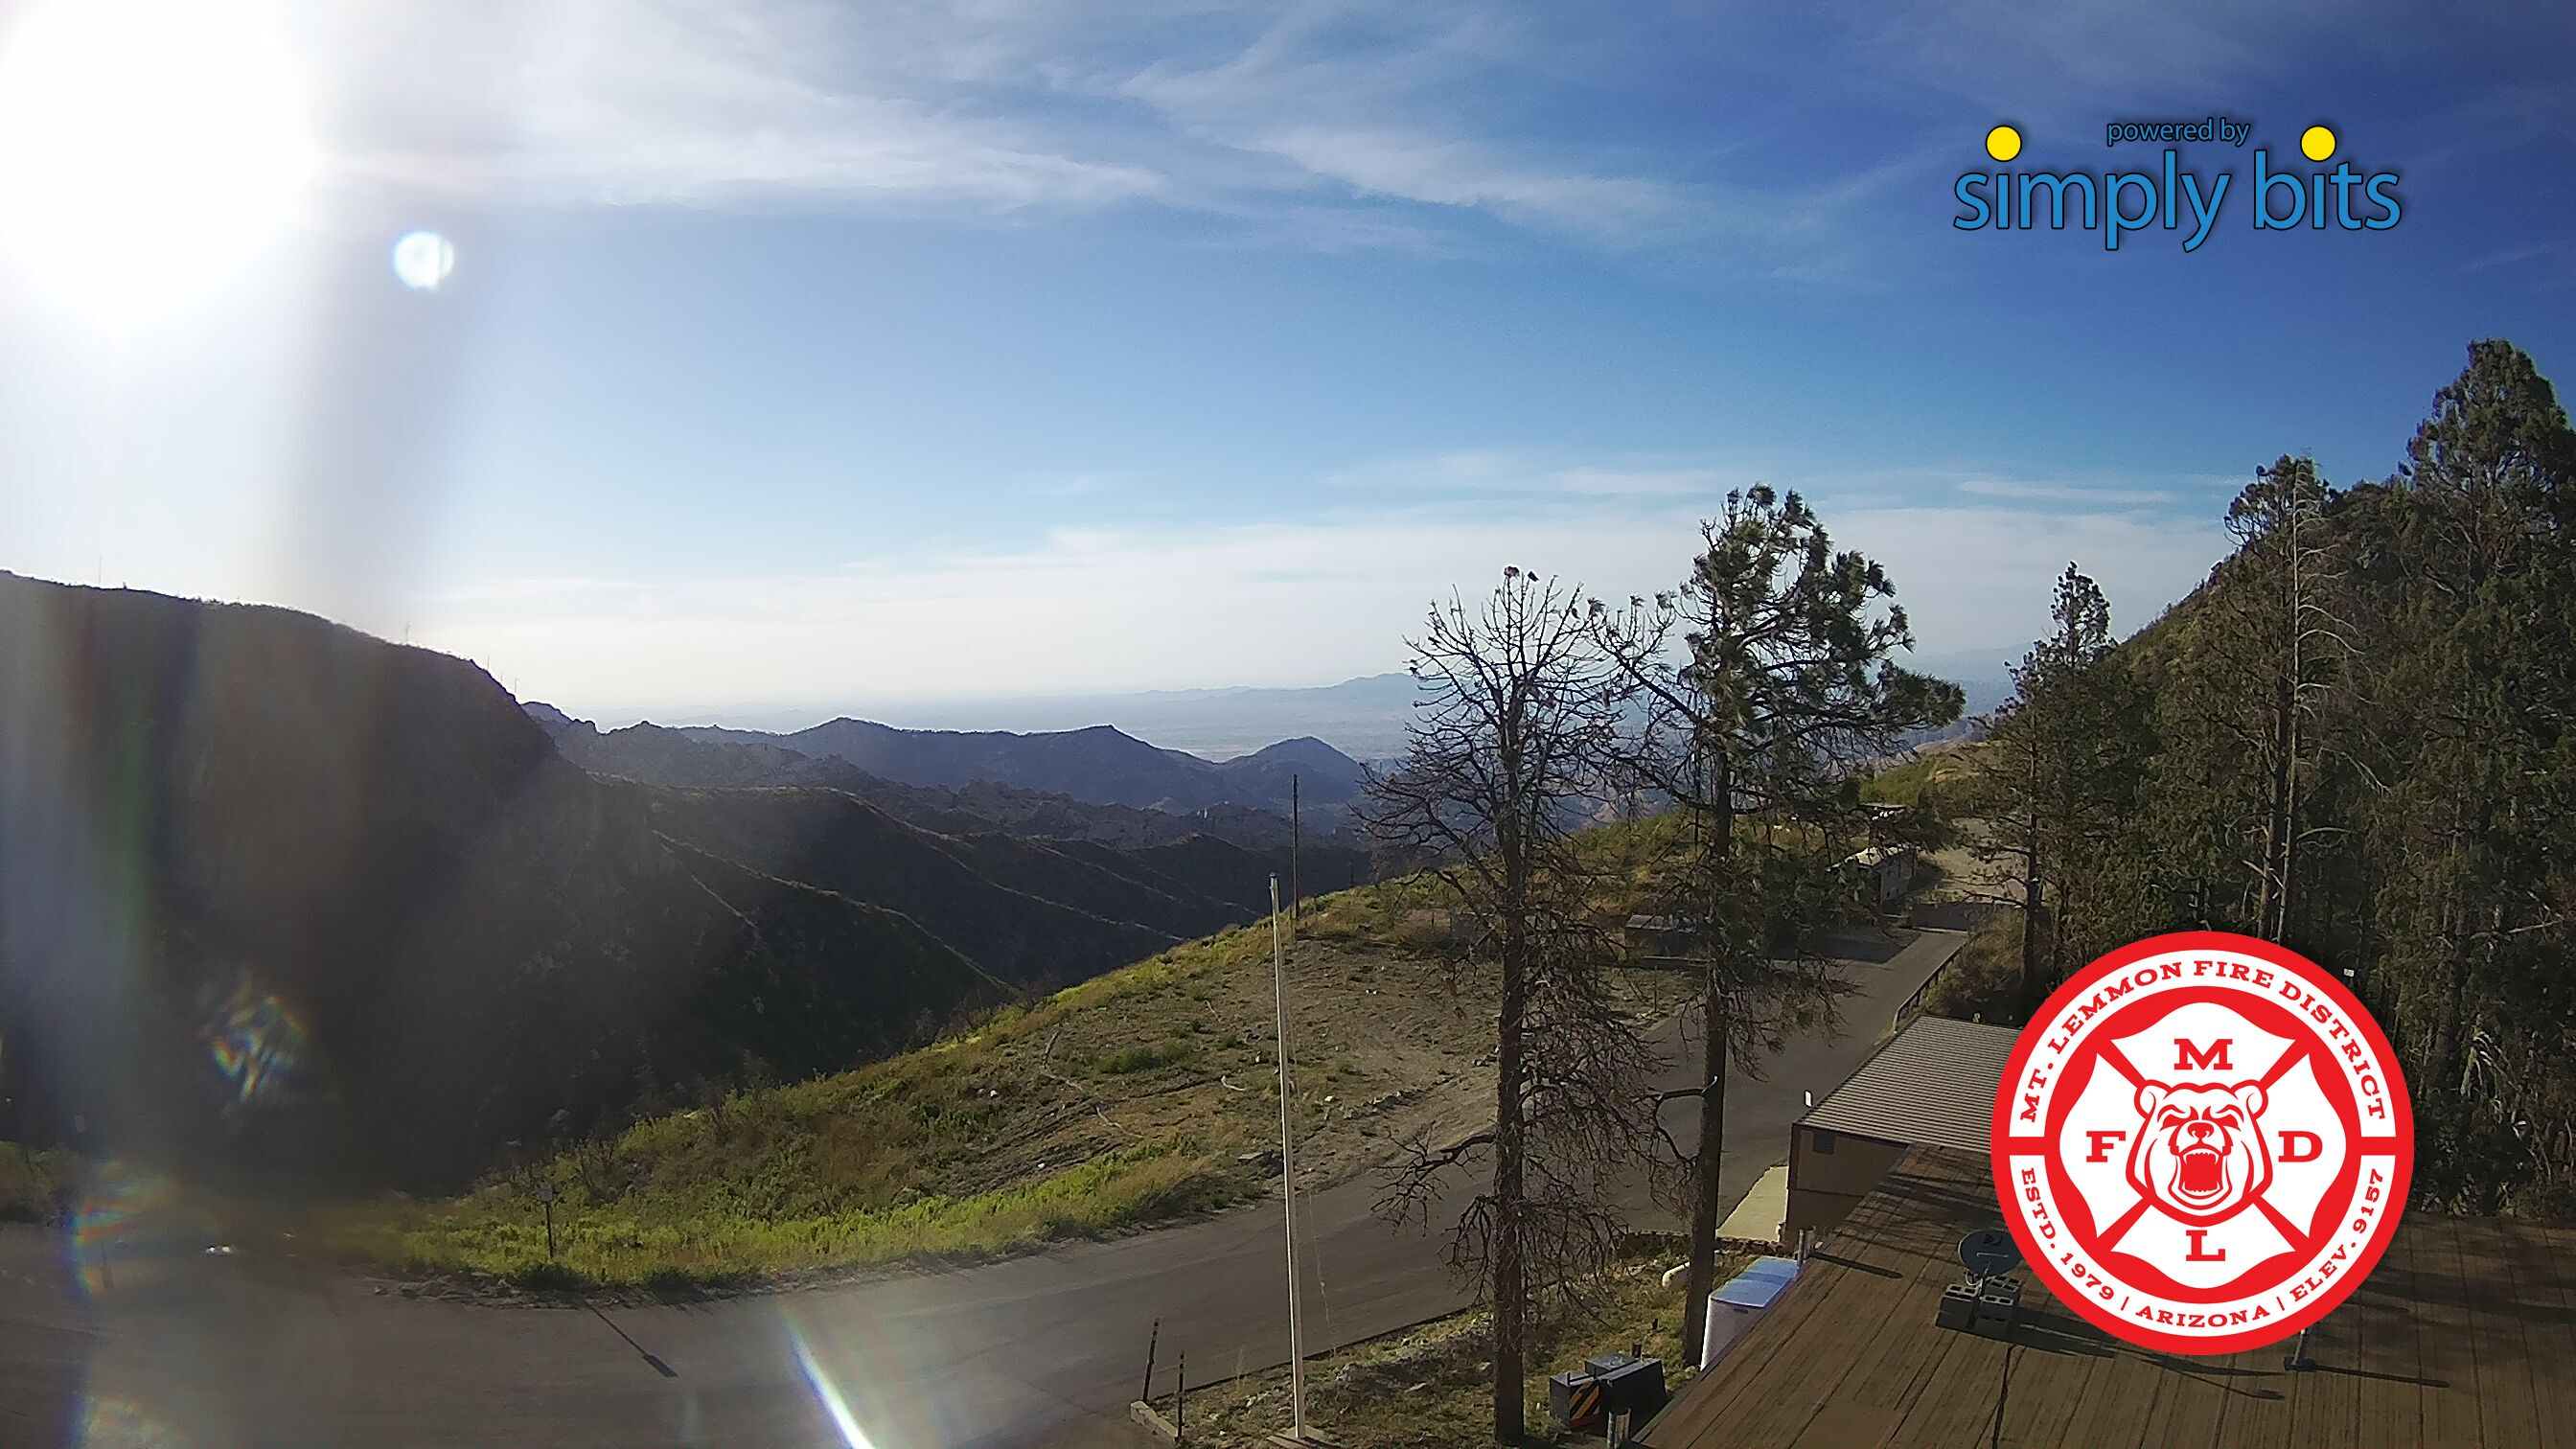 Mount Lemmon Fire Department 2 - Phoenix and Arizona